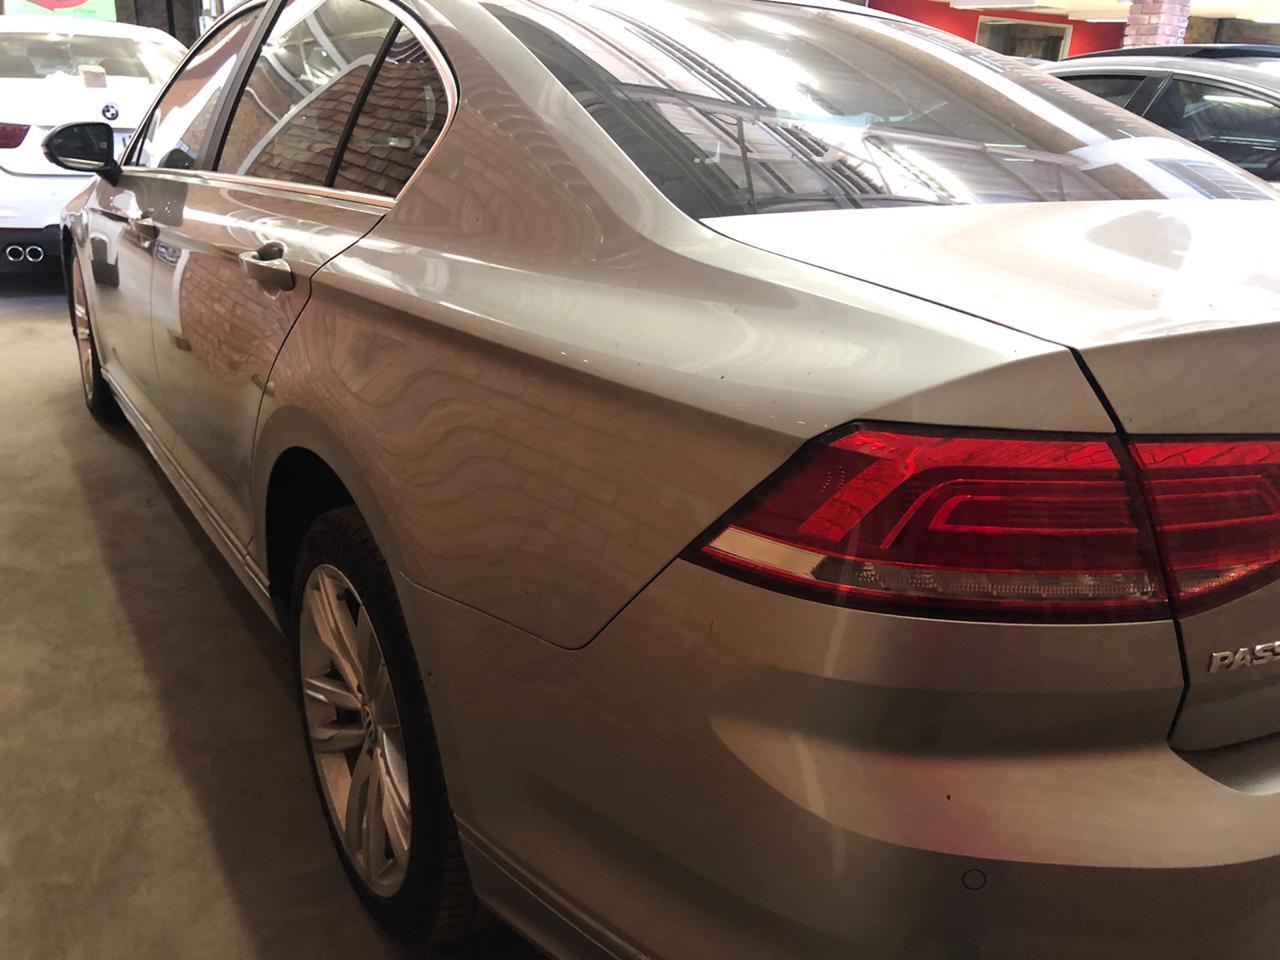 2017 VW Passat 2.0TDI Luxury R Line